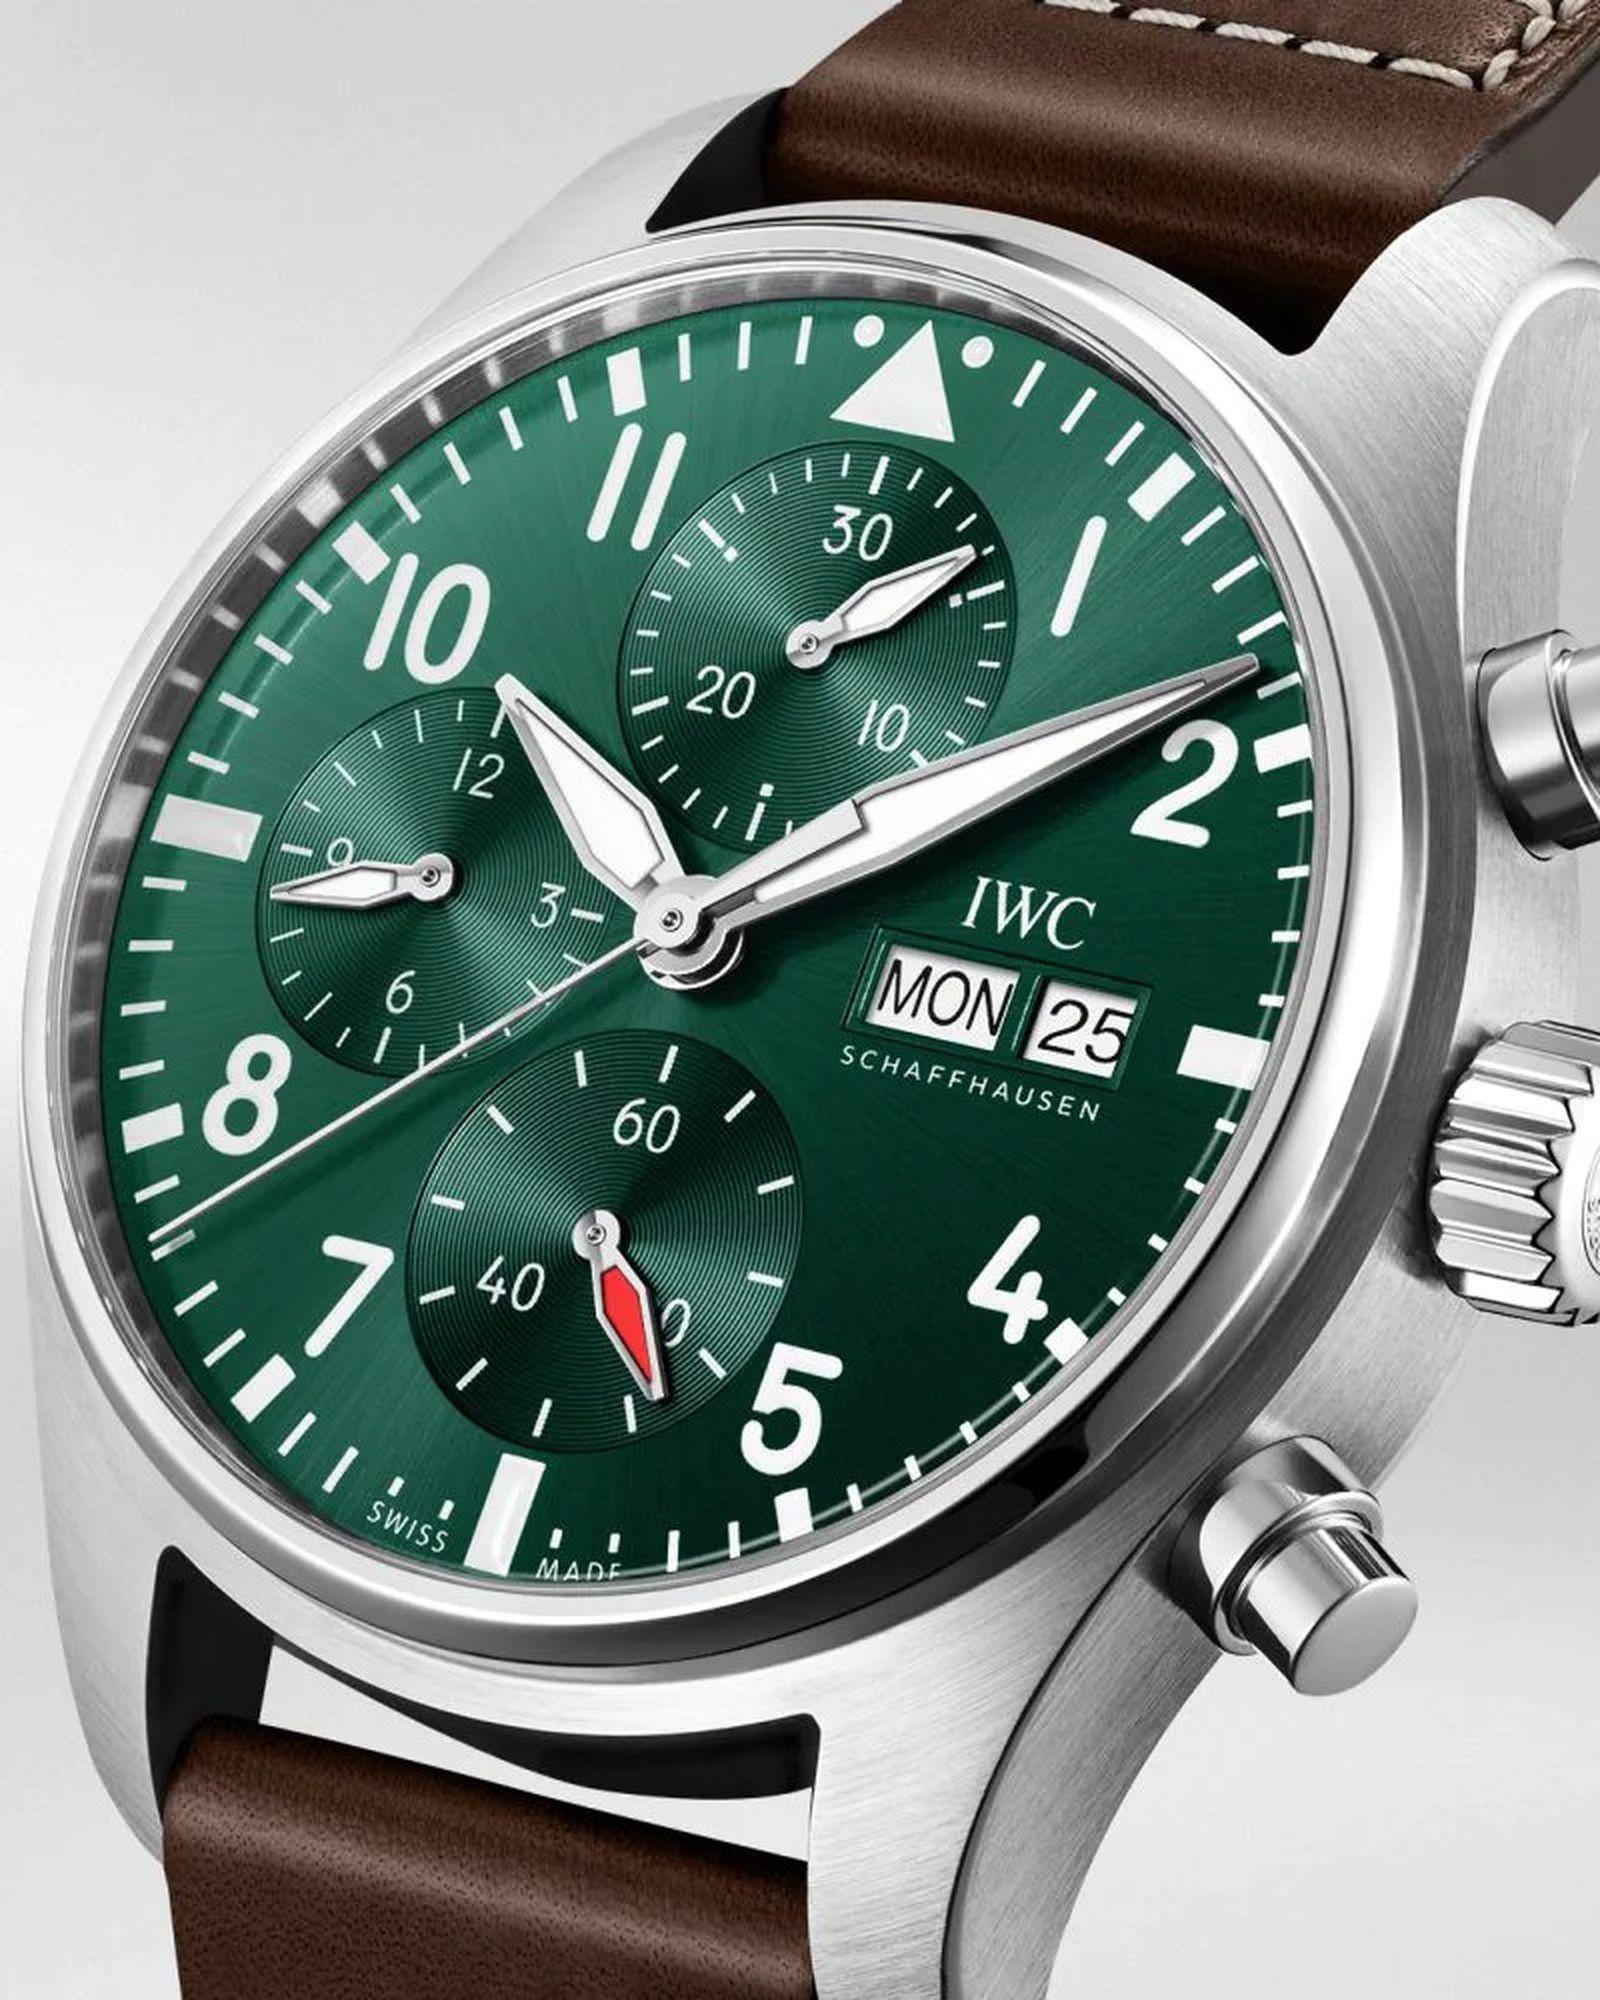 watches-and-wonders-2021-recap-05